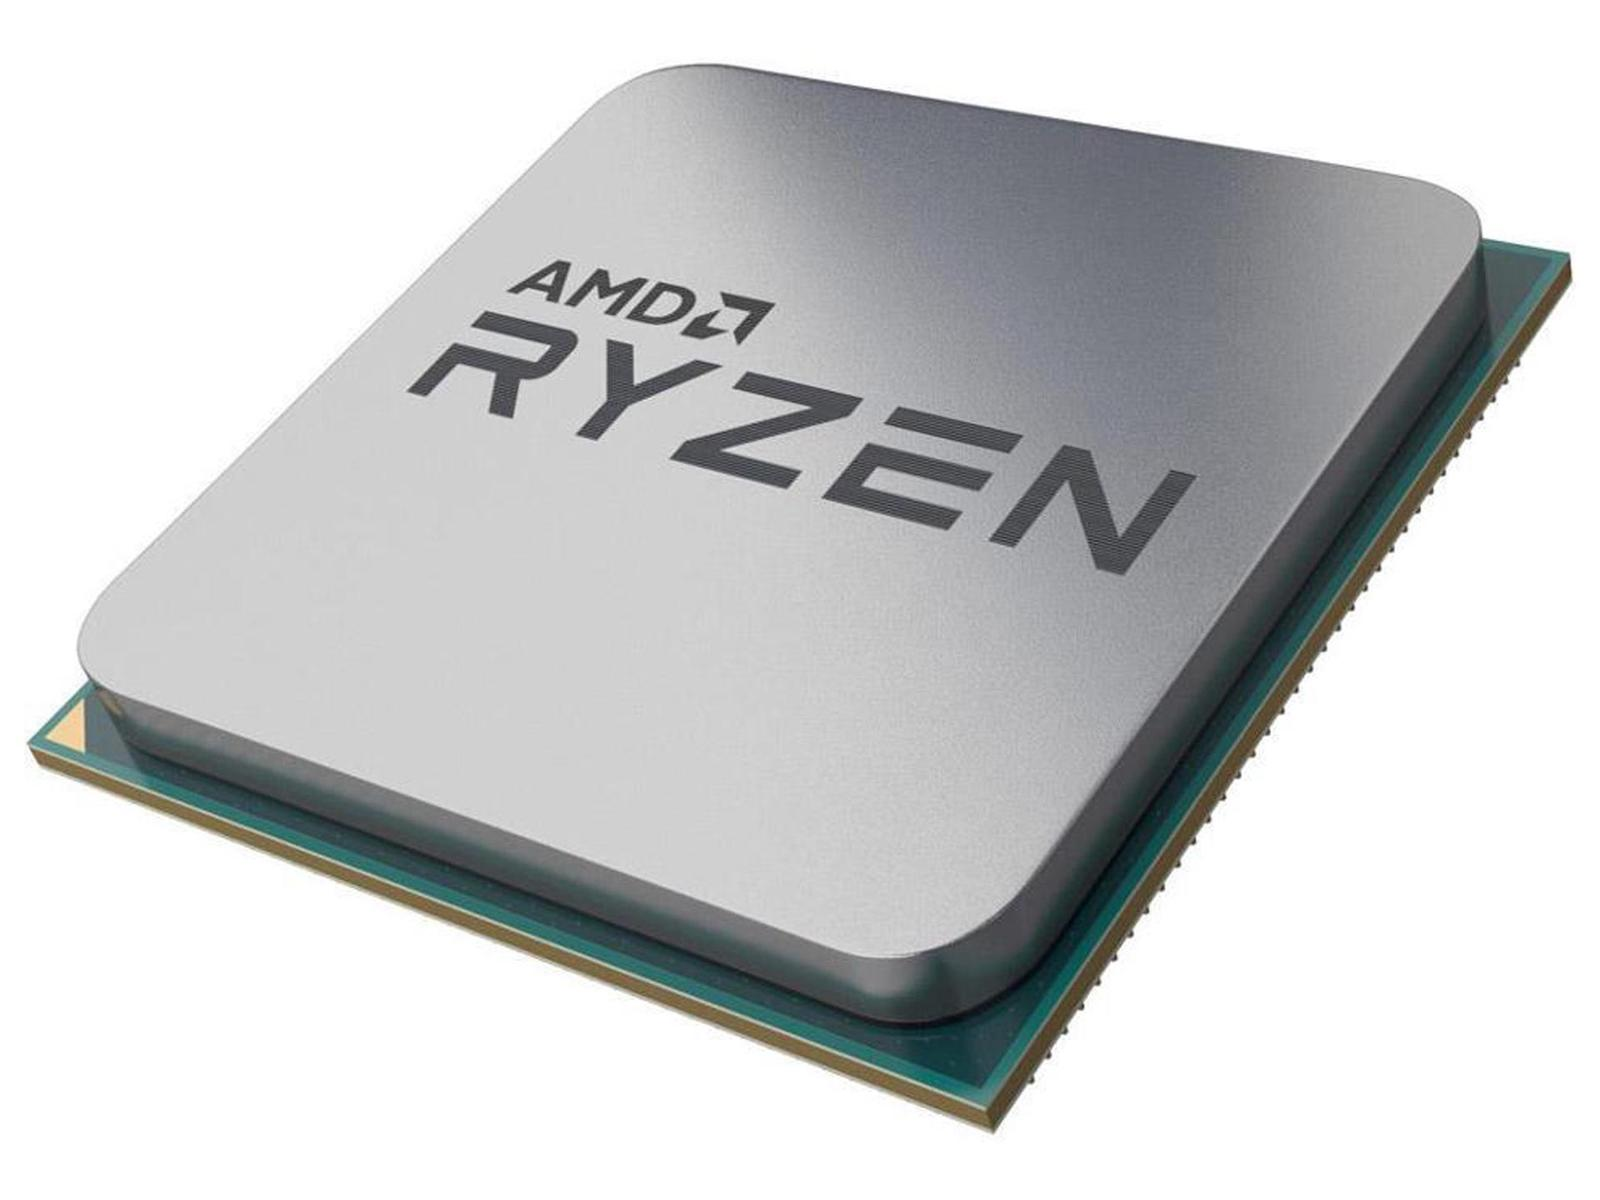 AMD Ryzen 5 2400G 3.6 GHz Quad-Core OEM/Tray Processor